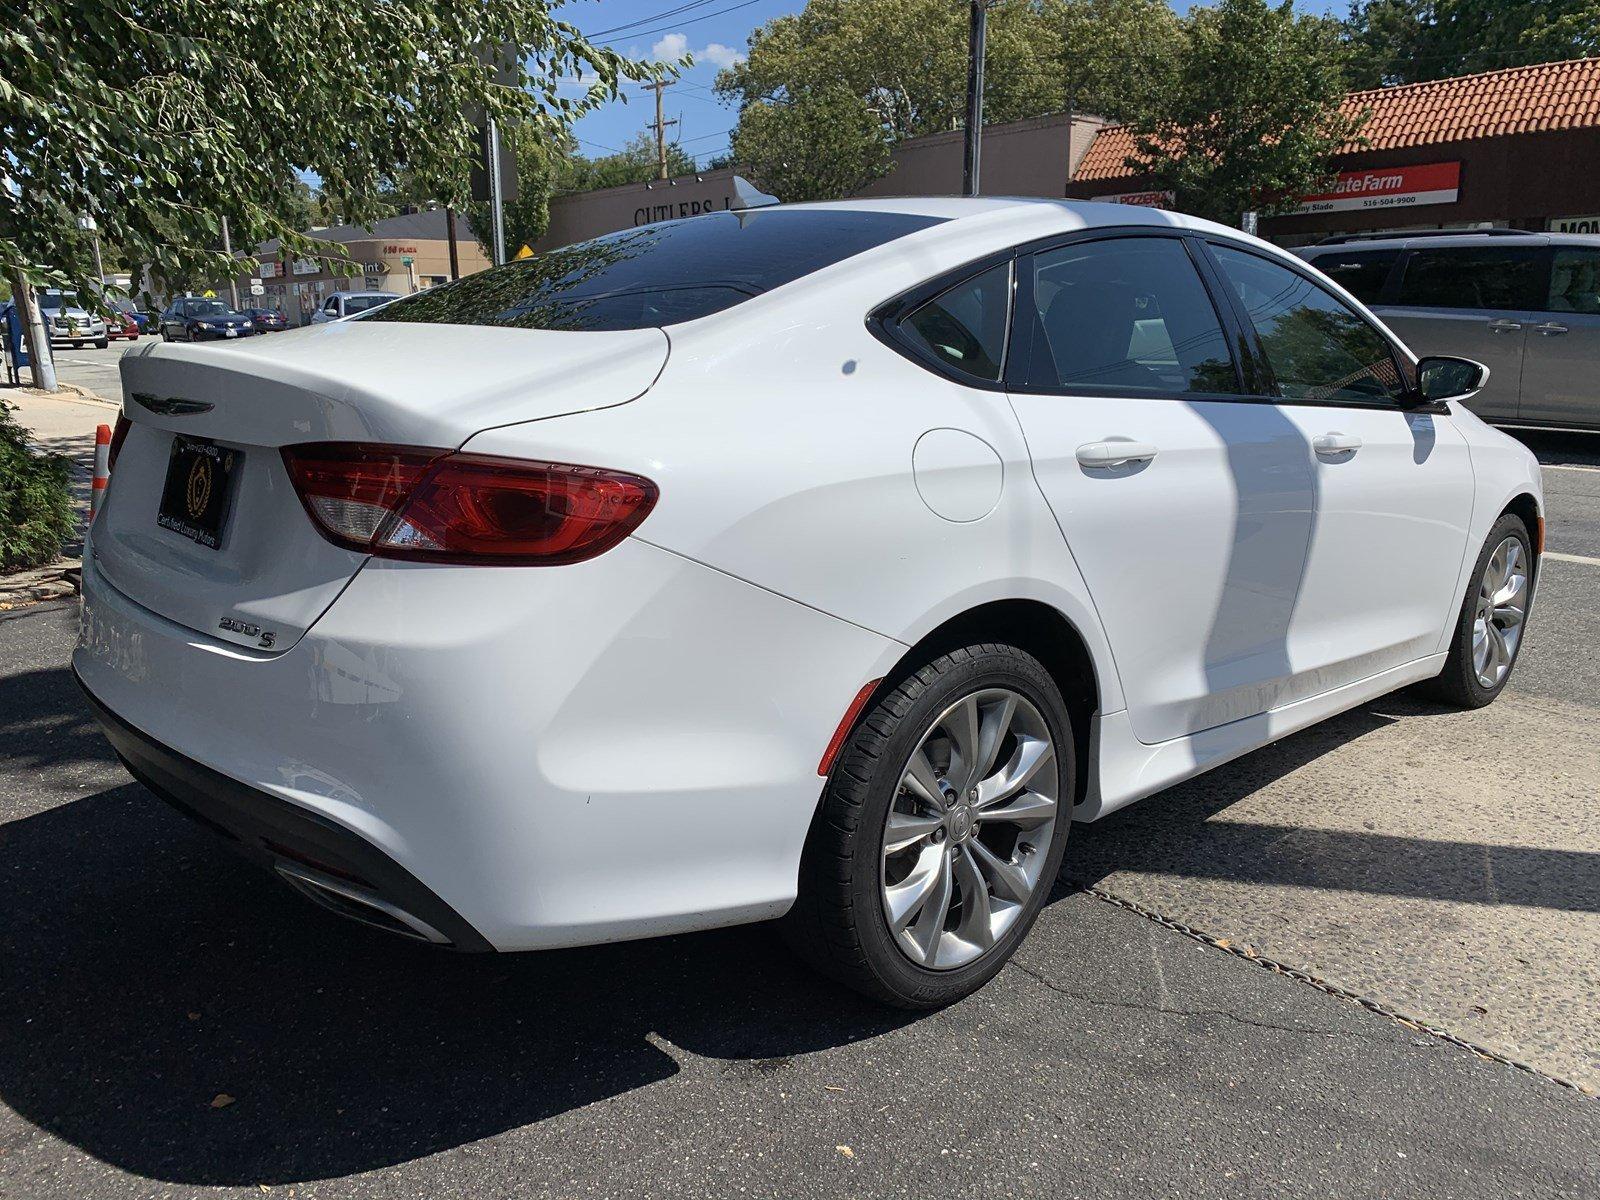 Used-2015-Chrysler-200-S-(Leather,Navi,Backup-Cam)